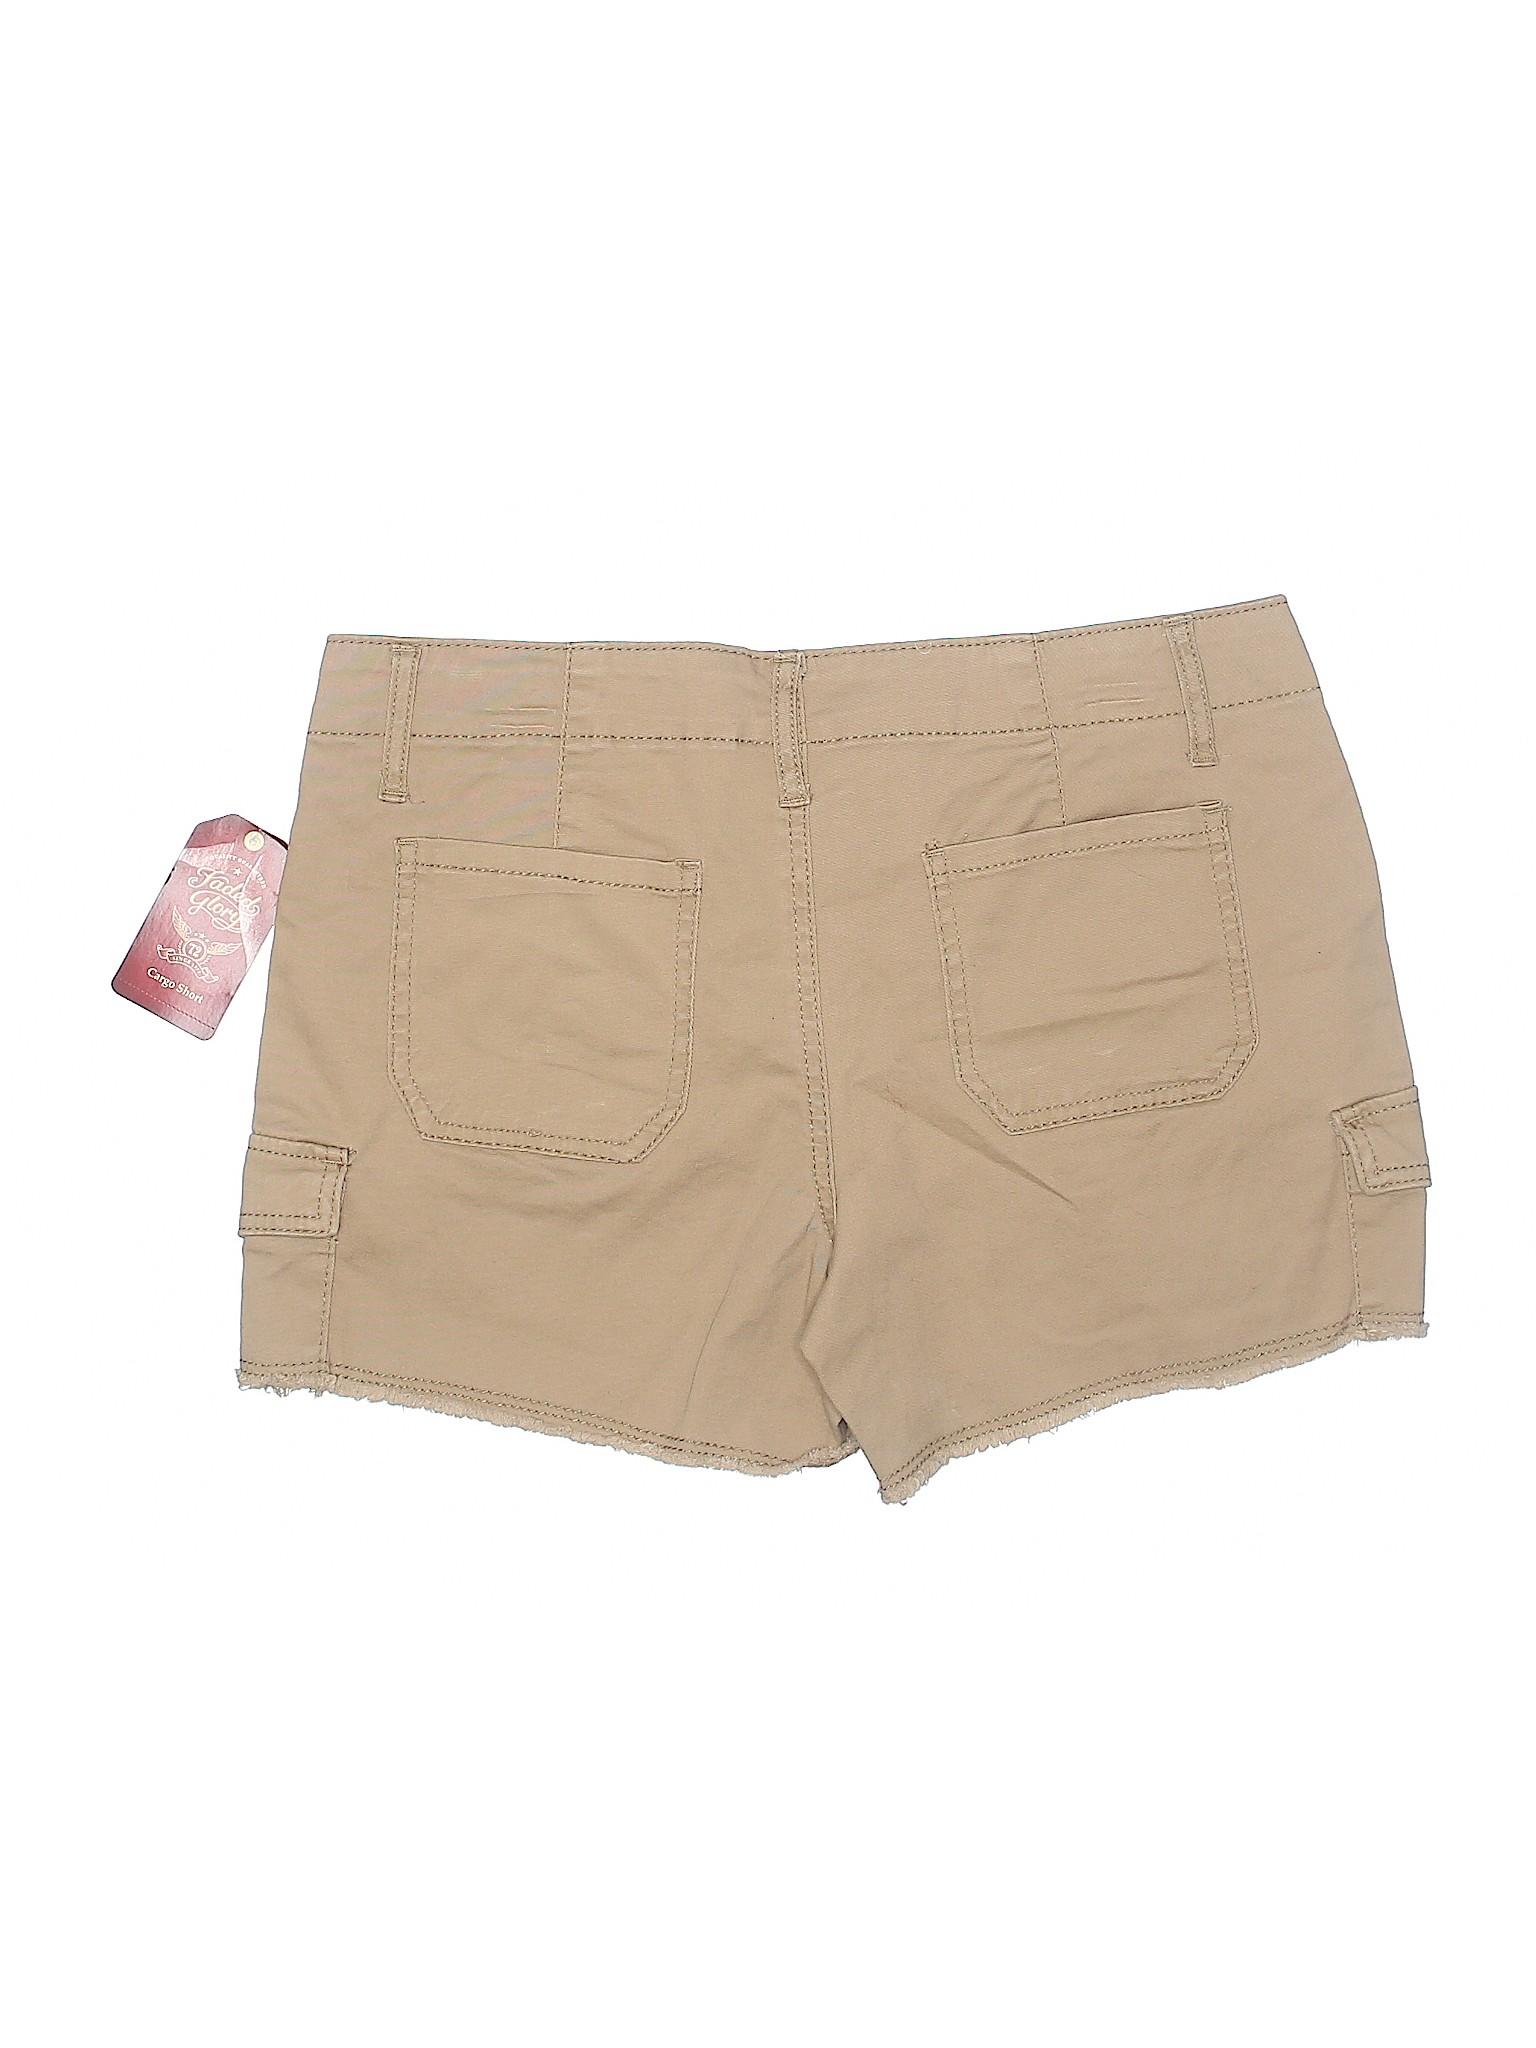 Shorts Glory Faded Plus Cargo Boutique IO8wq8